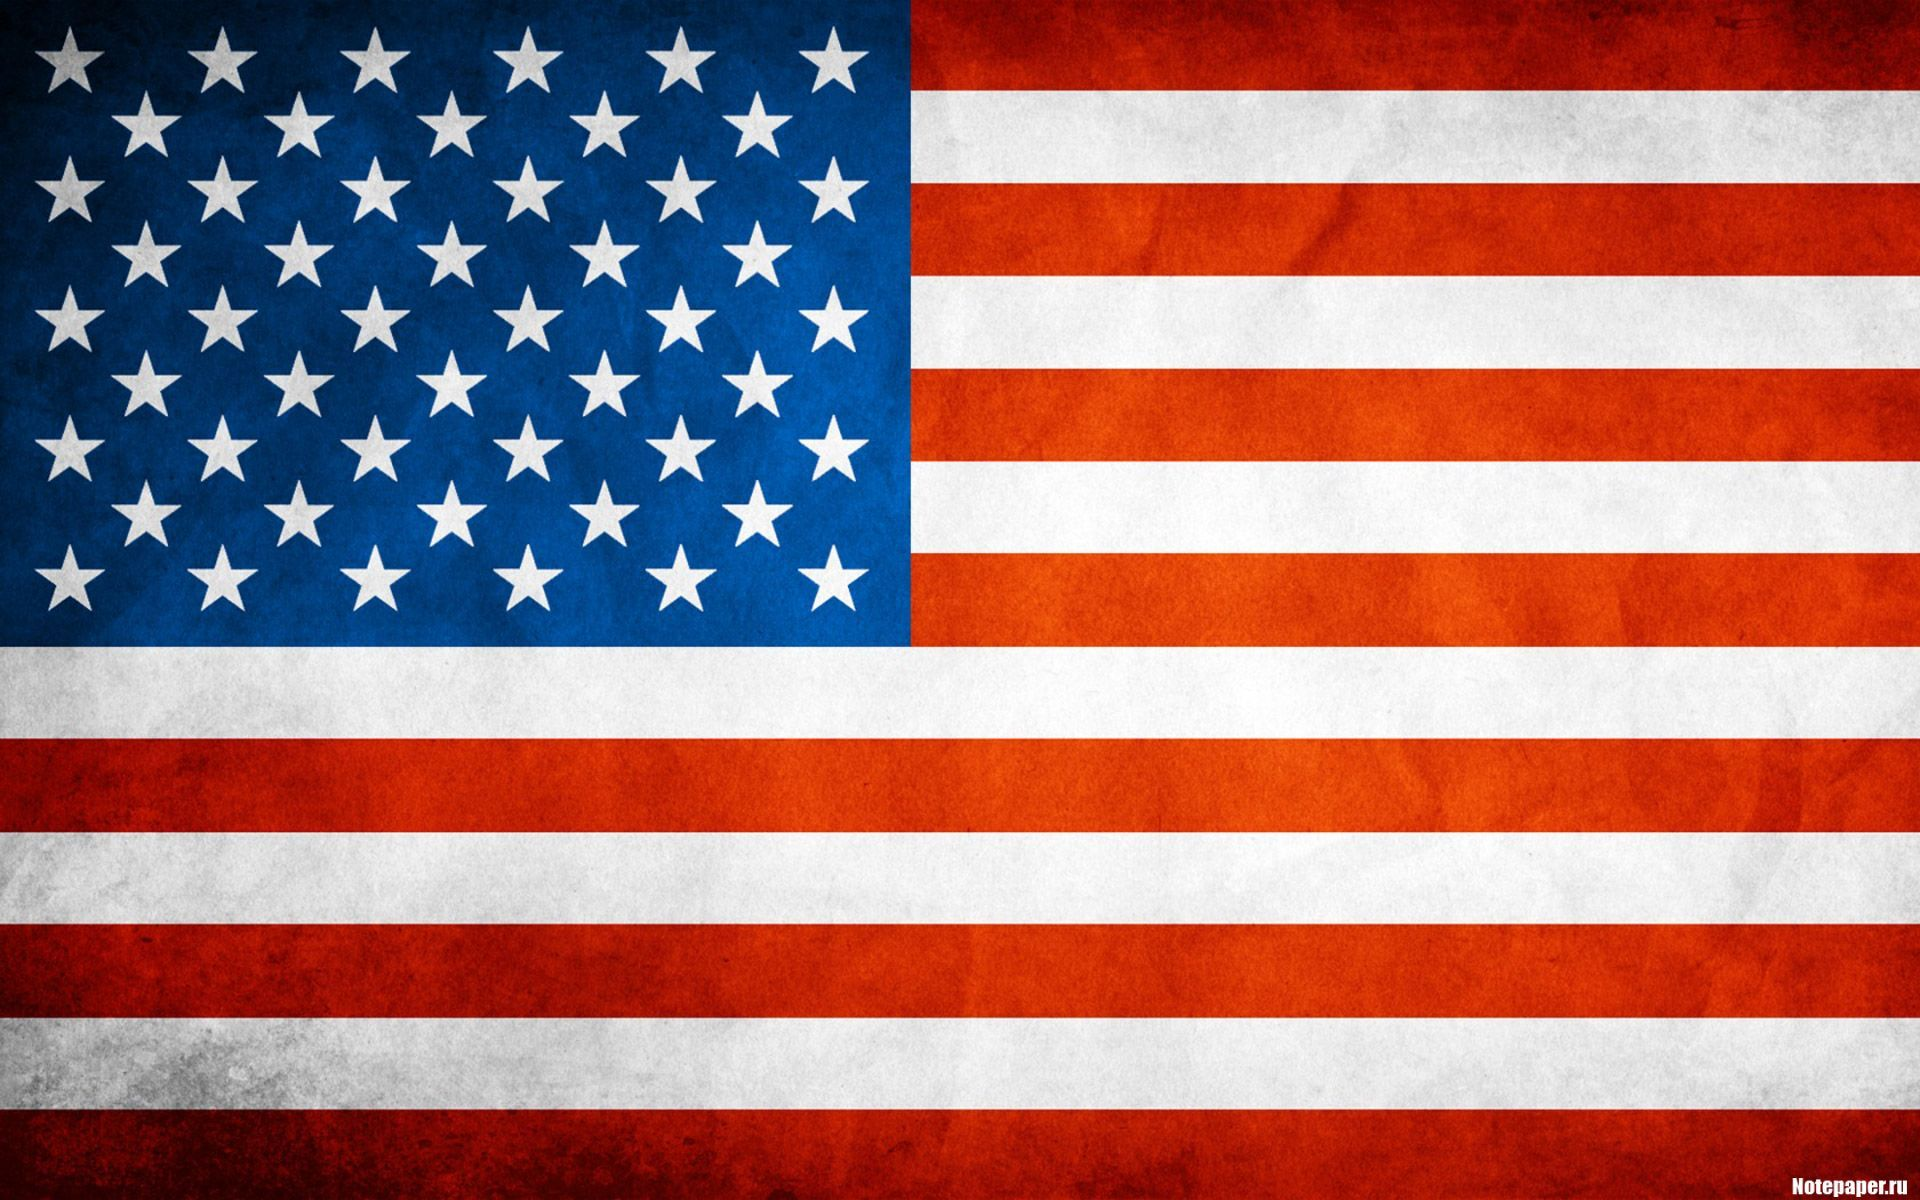 God Bless America | American flag wallpaper and Wallpaper